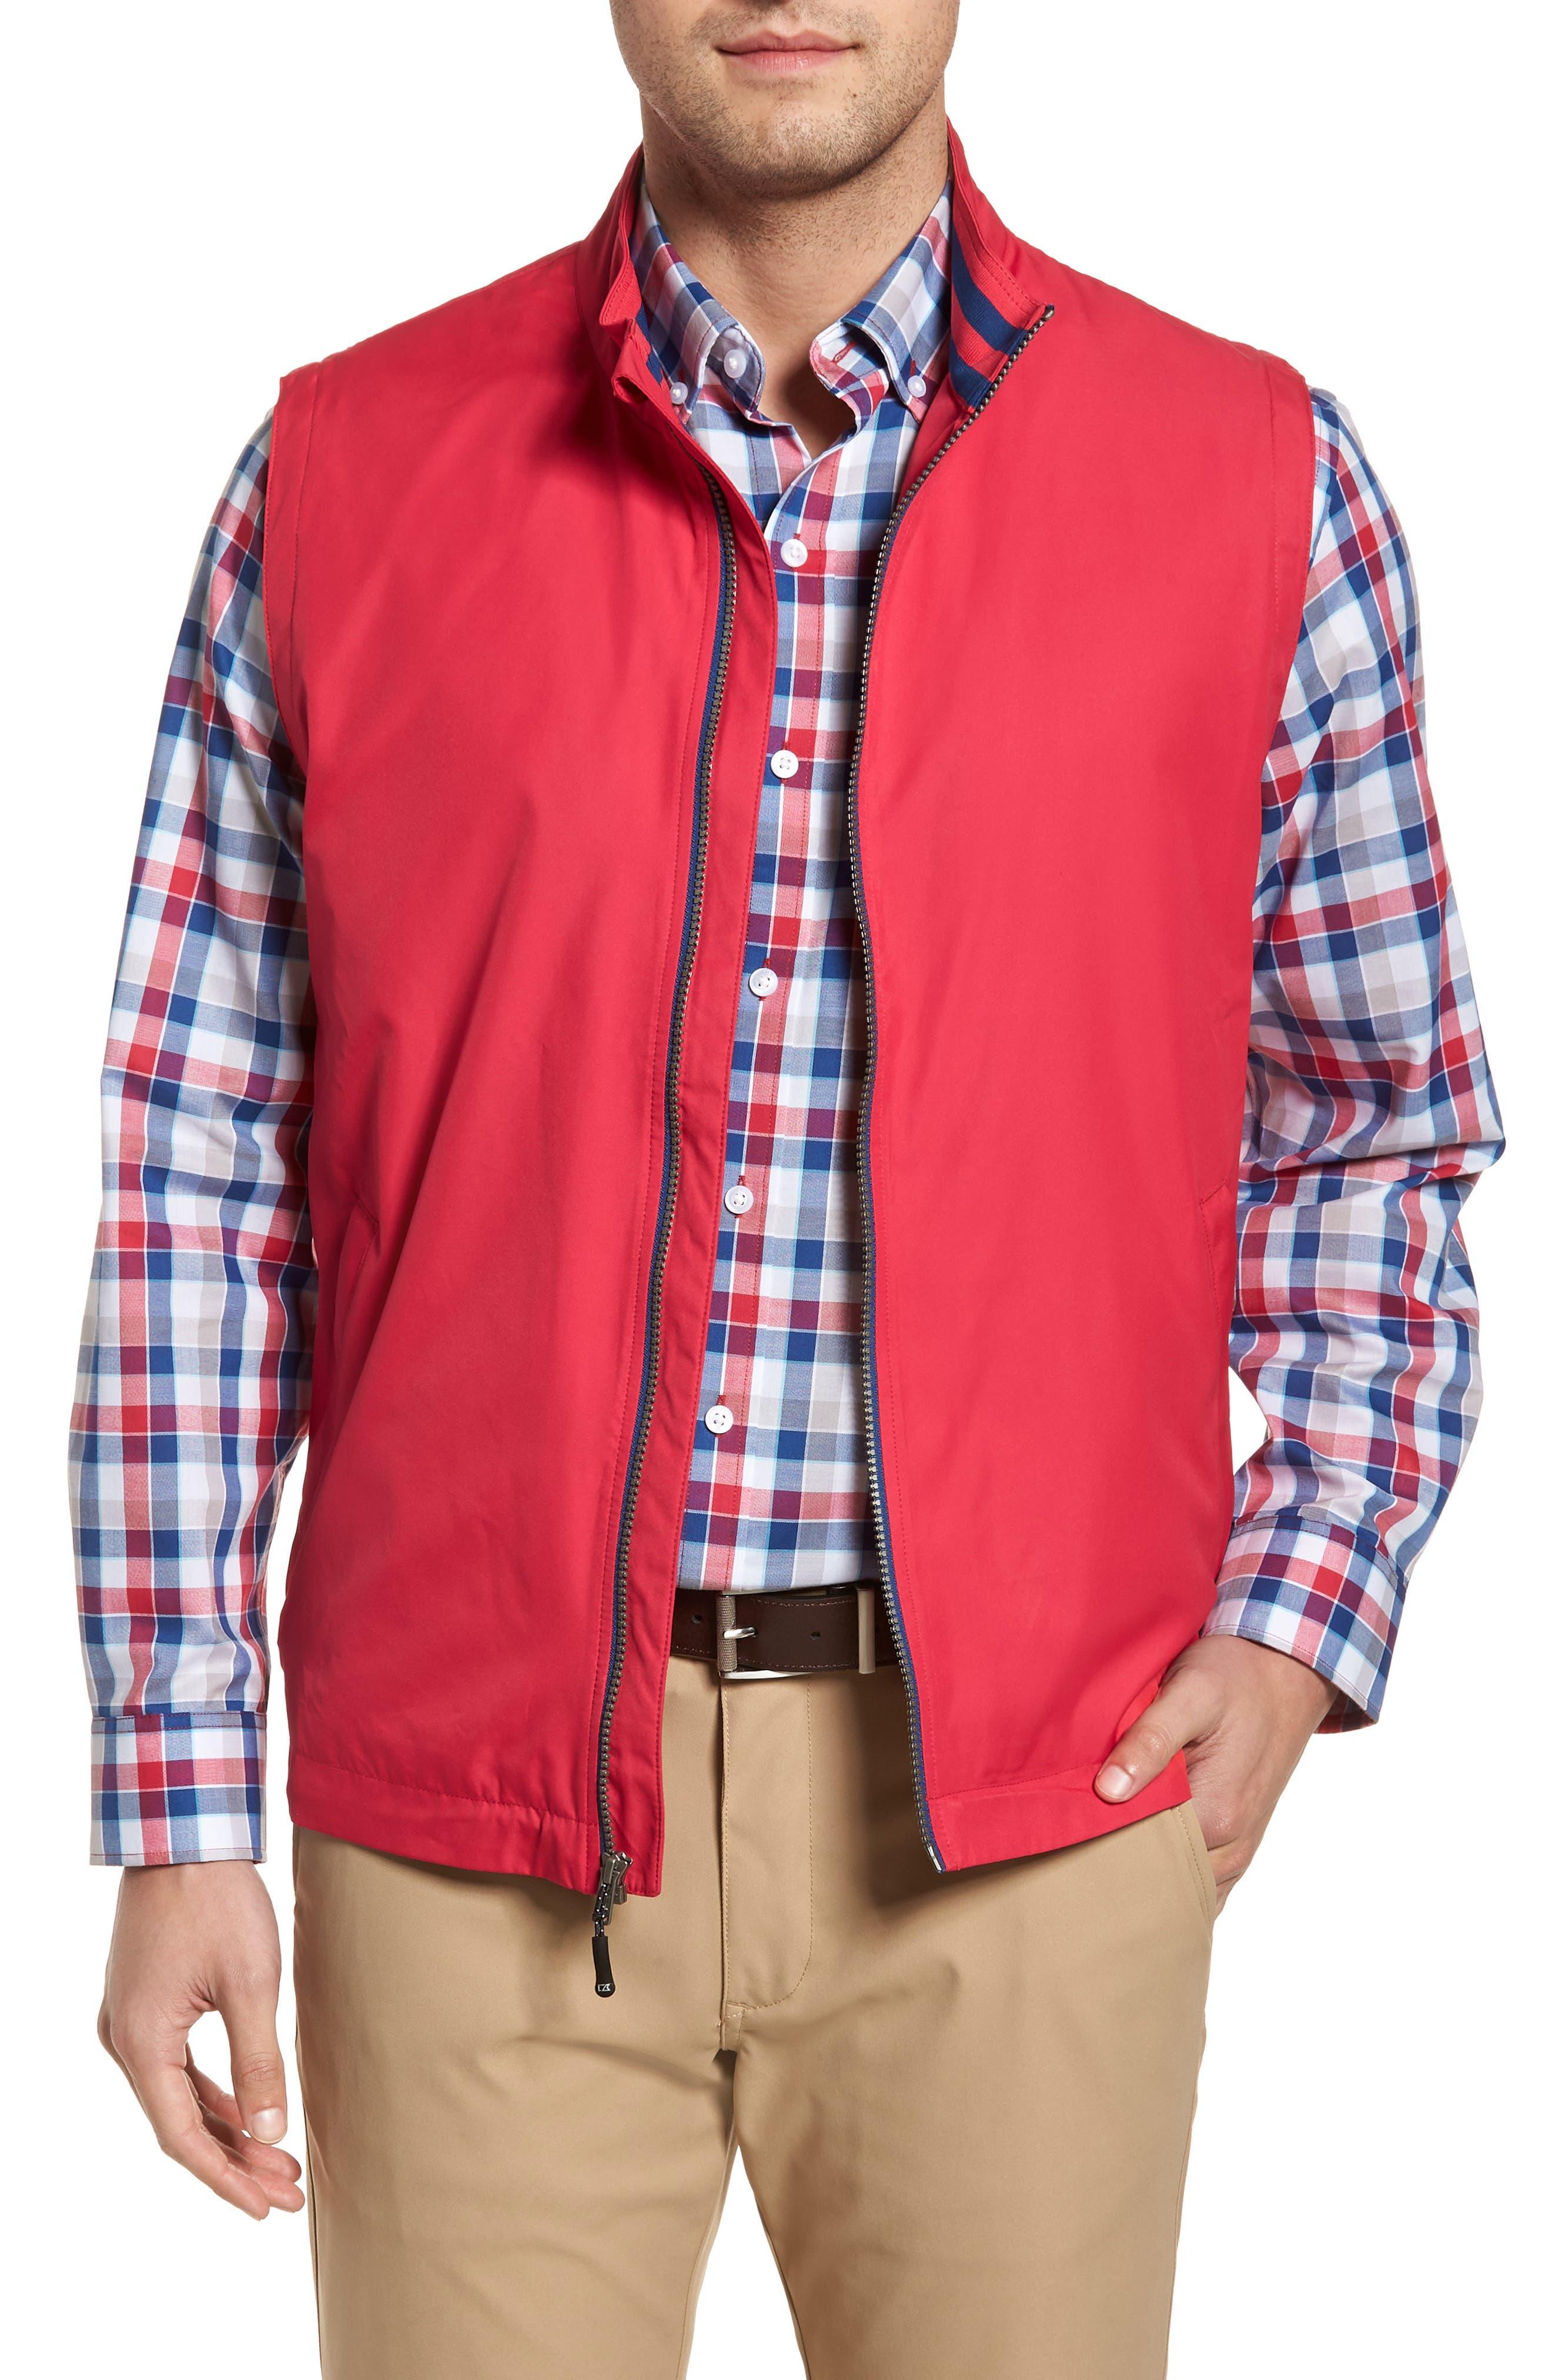 Nine Iron DryTec Zip Vest,                             Main thumbnail 1, color,                             Virtual